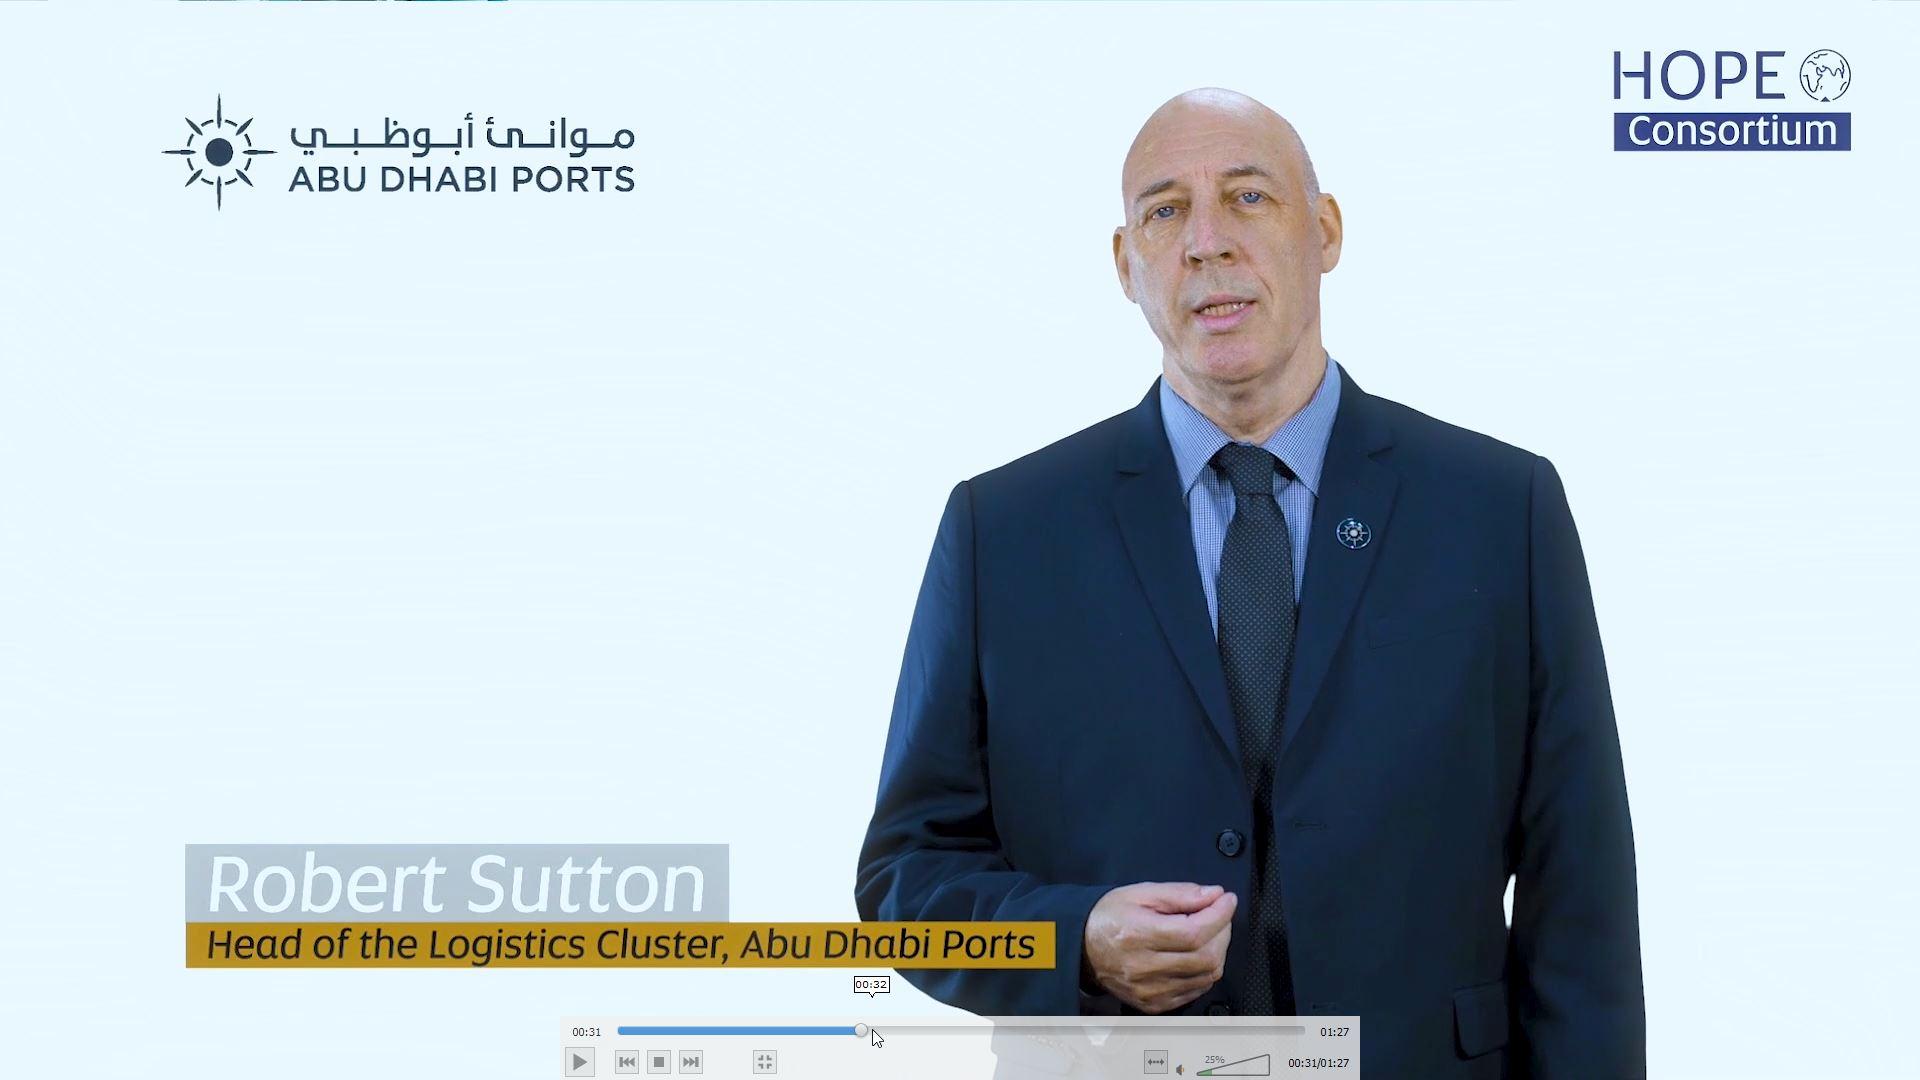 hope consortium world immunization and logistics summit virtual exhibition guest speaker